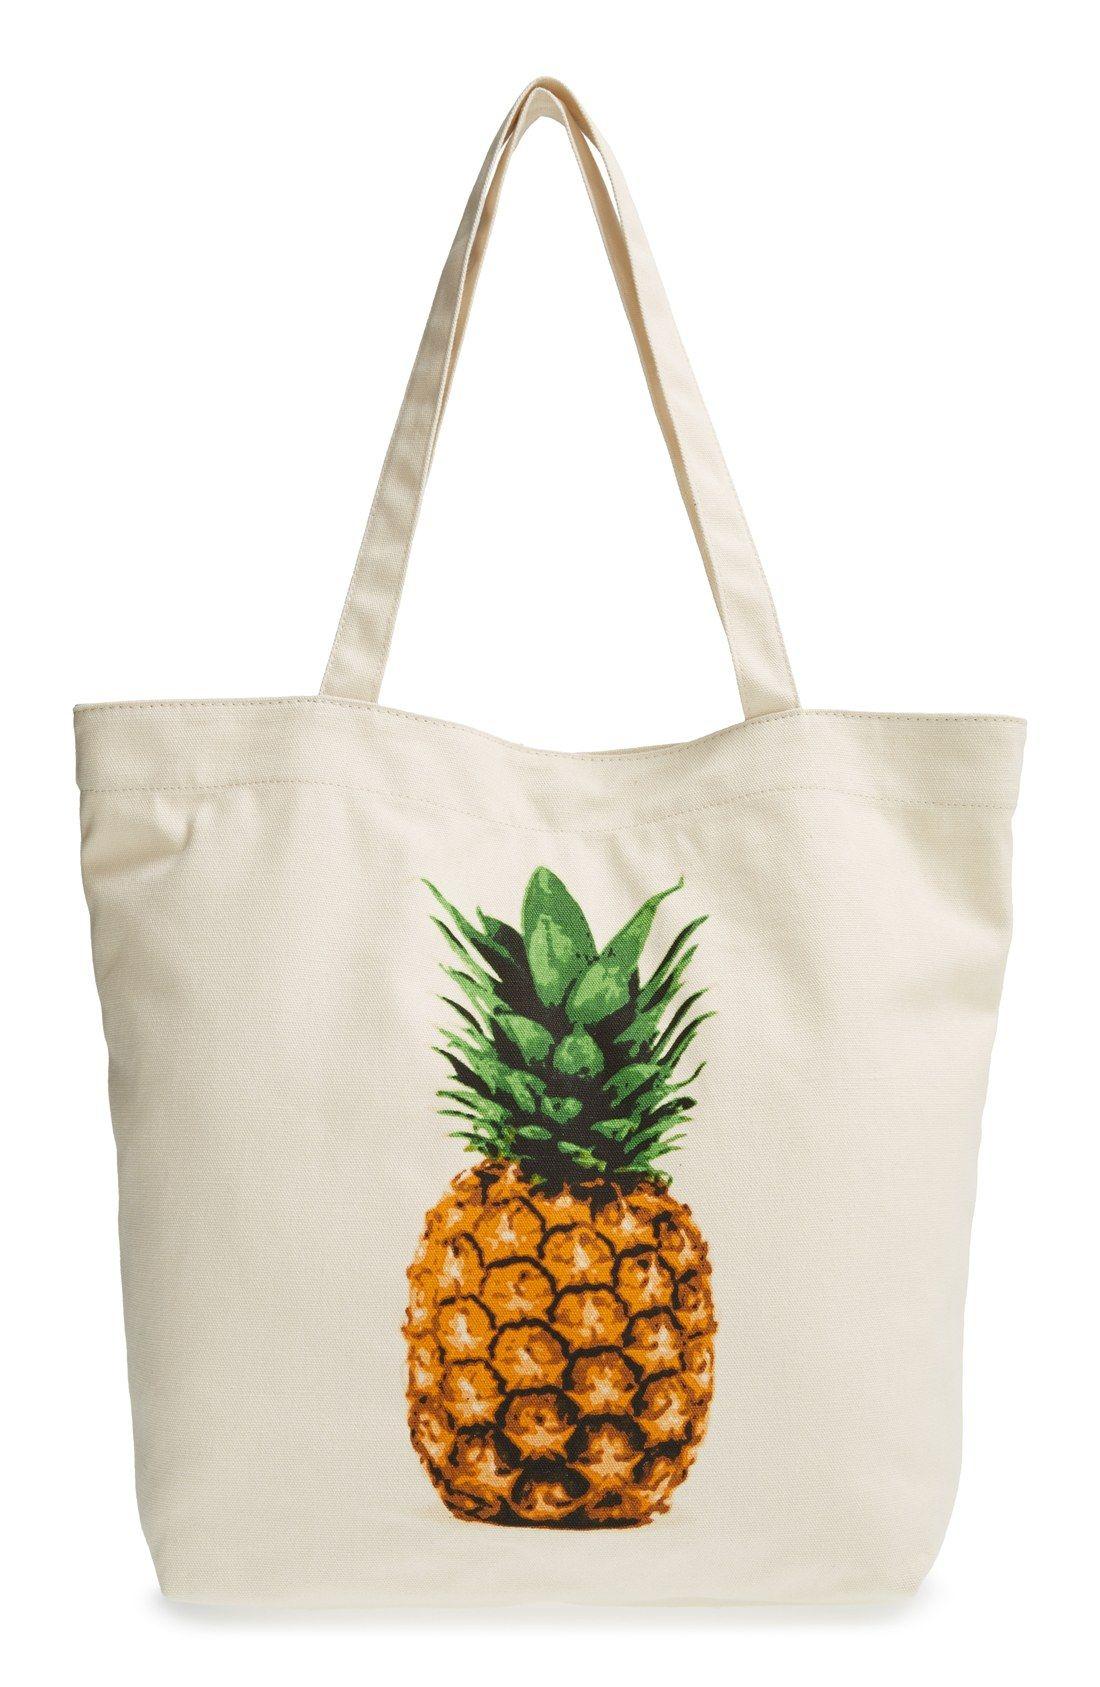 VIDA Tote Bag - Cacti Blossom 7 by VIDA v6tn95YxQ